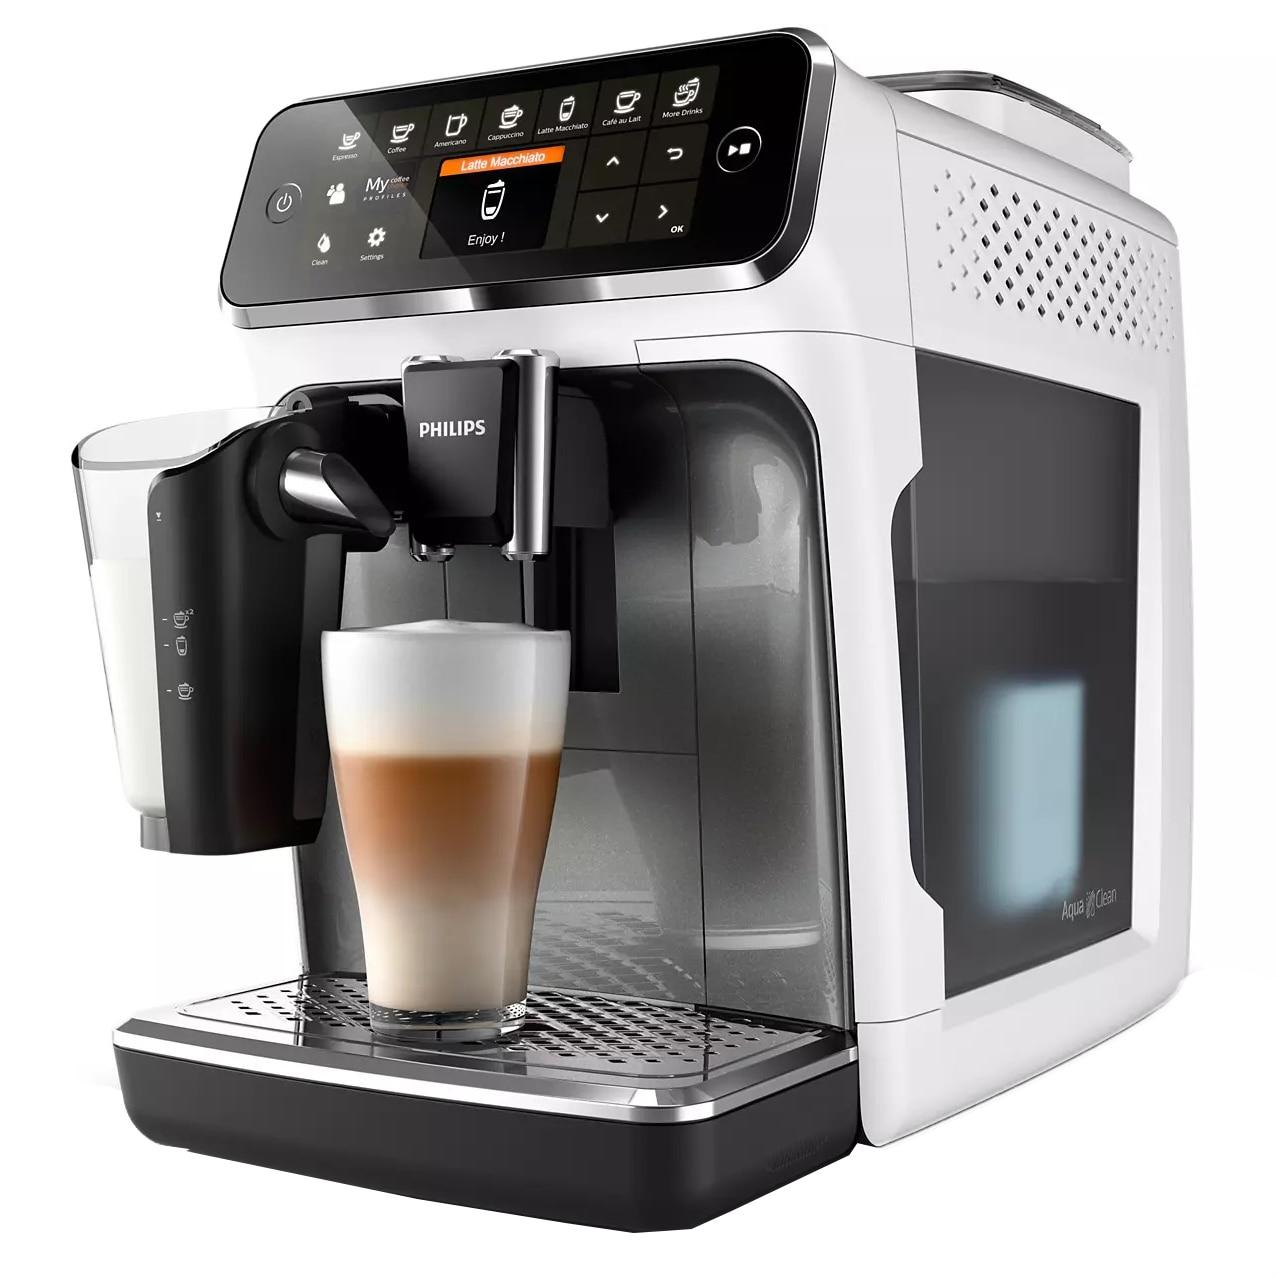 Fotografie Espressor automat Philips Seria 4300 EP4343/70, sistem de lapte LatteGo, 8 bauturi, display digital TFT in 3 culori, filtru AquaClean, rasnita ceramica, optiune cafea macinata, functie MEMO 2 profiluri, Alb